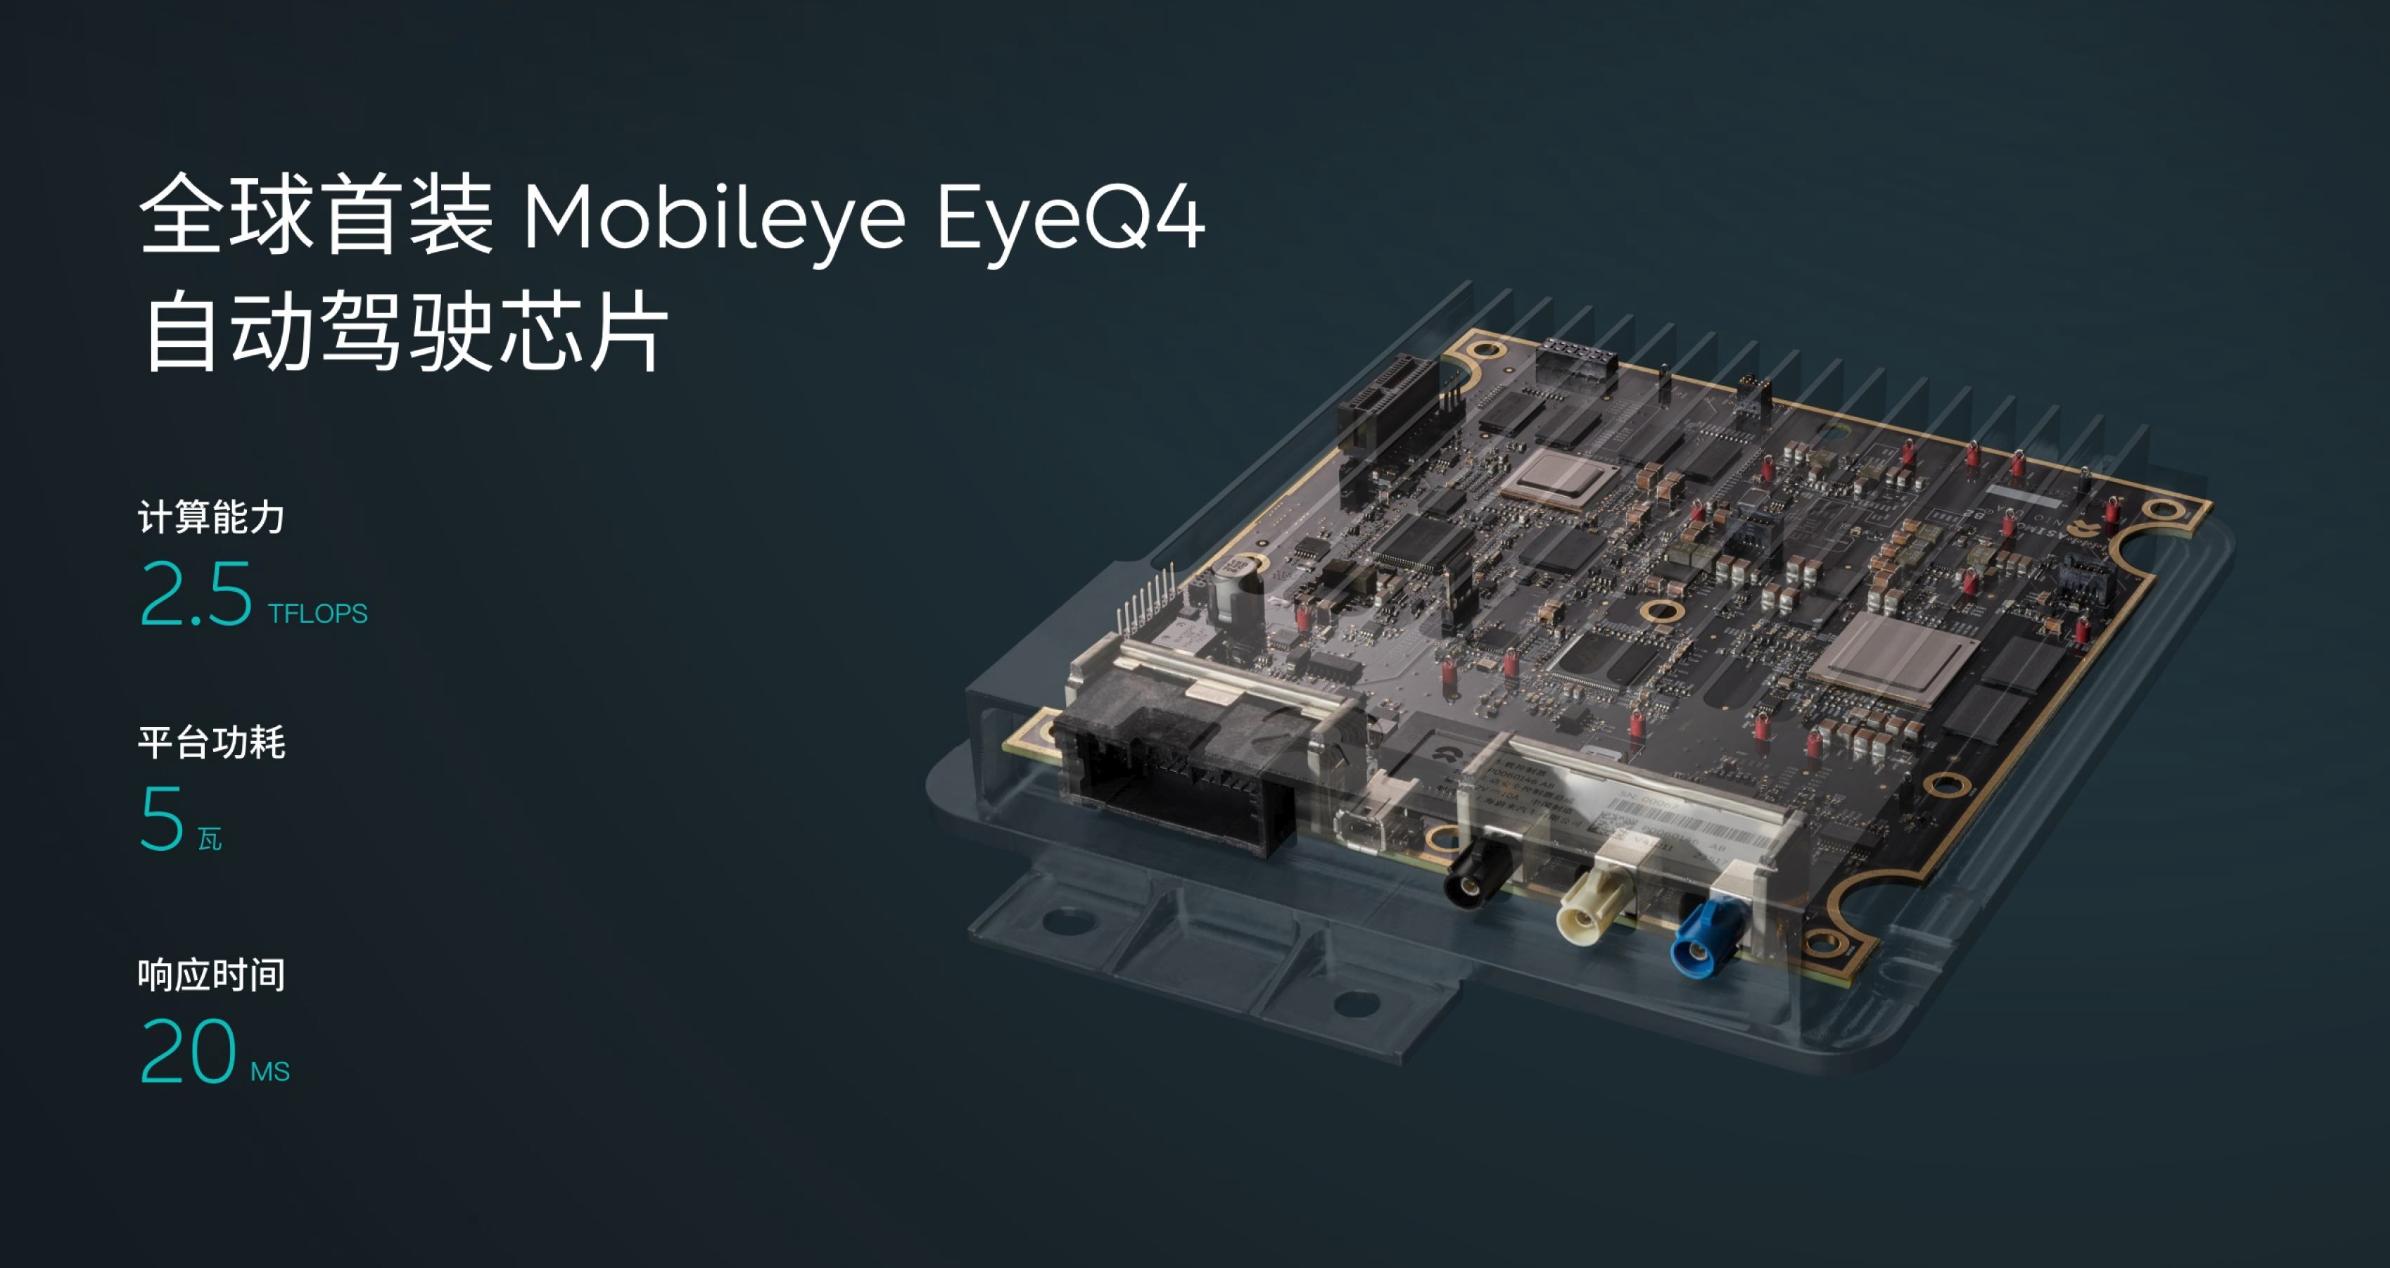 蔚来ES8全球首装Mobileye EyeQ4